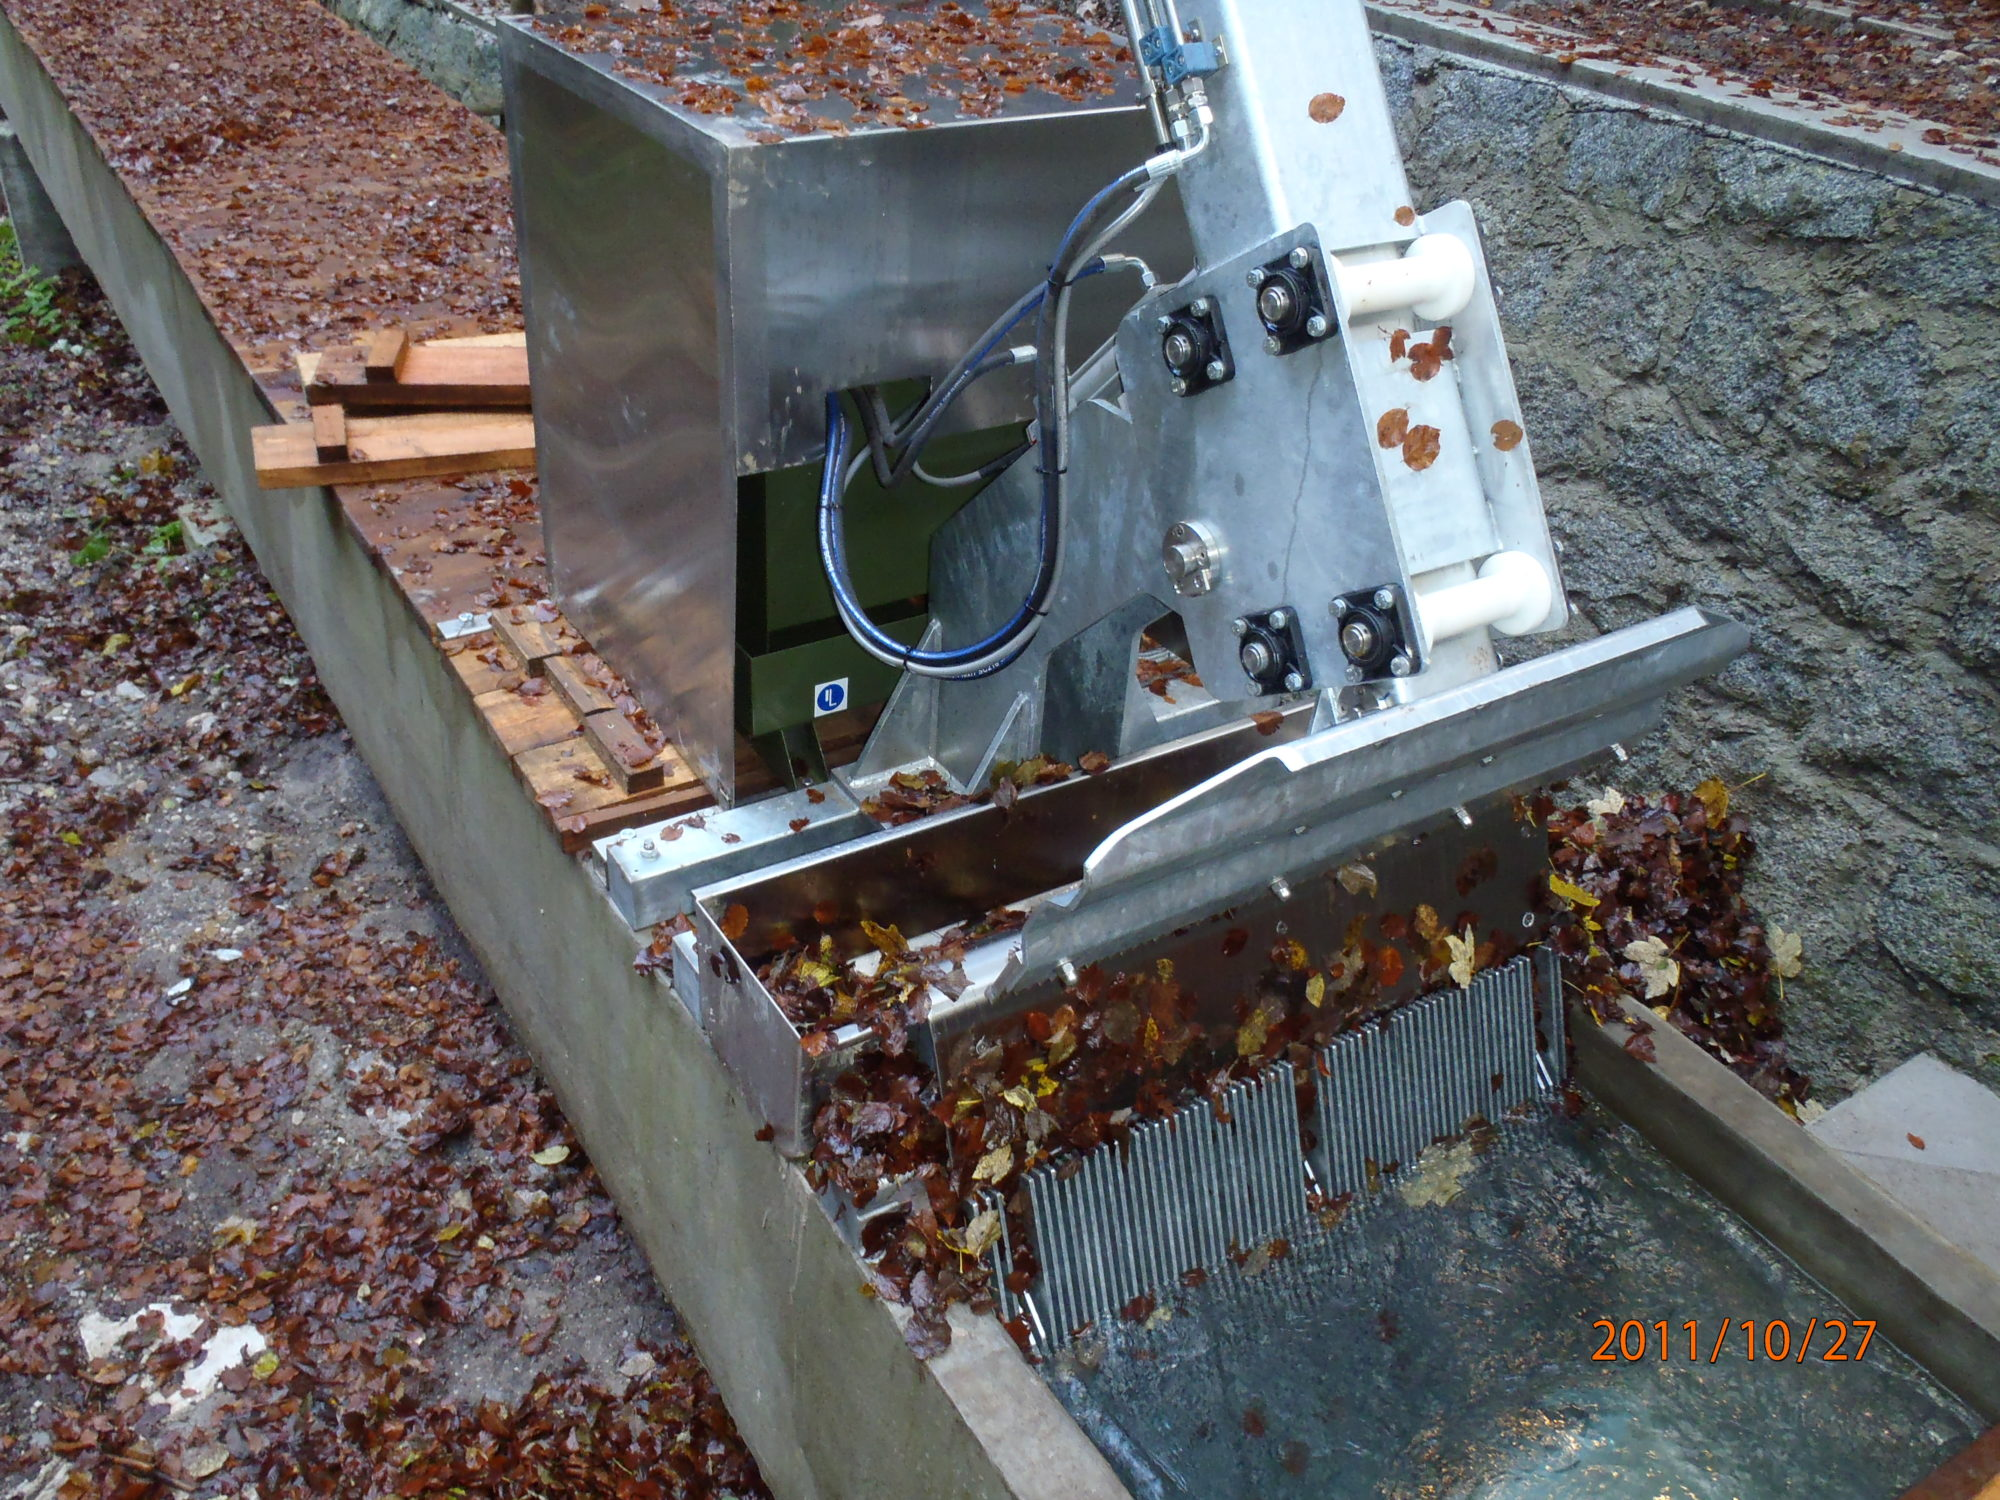 Rechenreiniger Einfache-Teleskopausführung